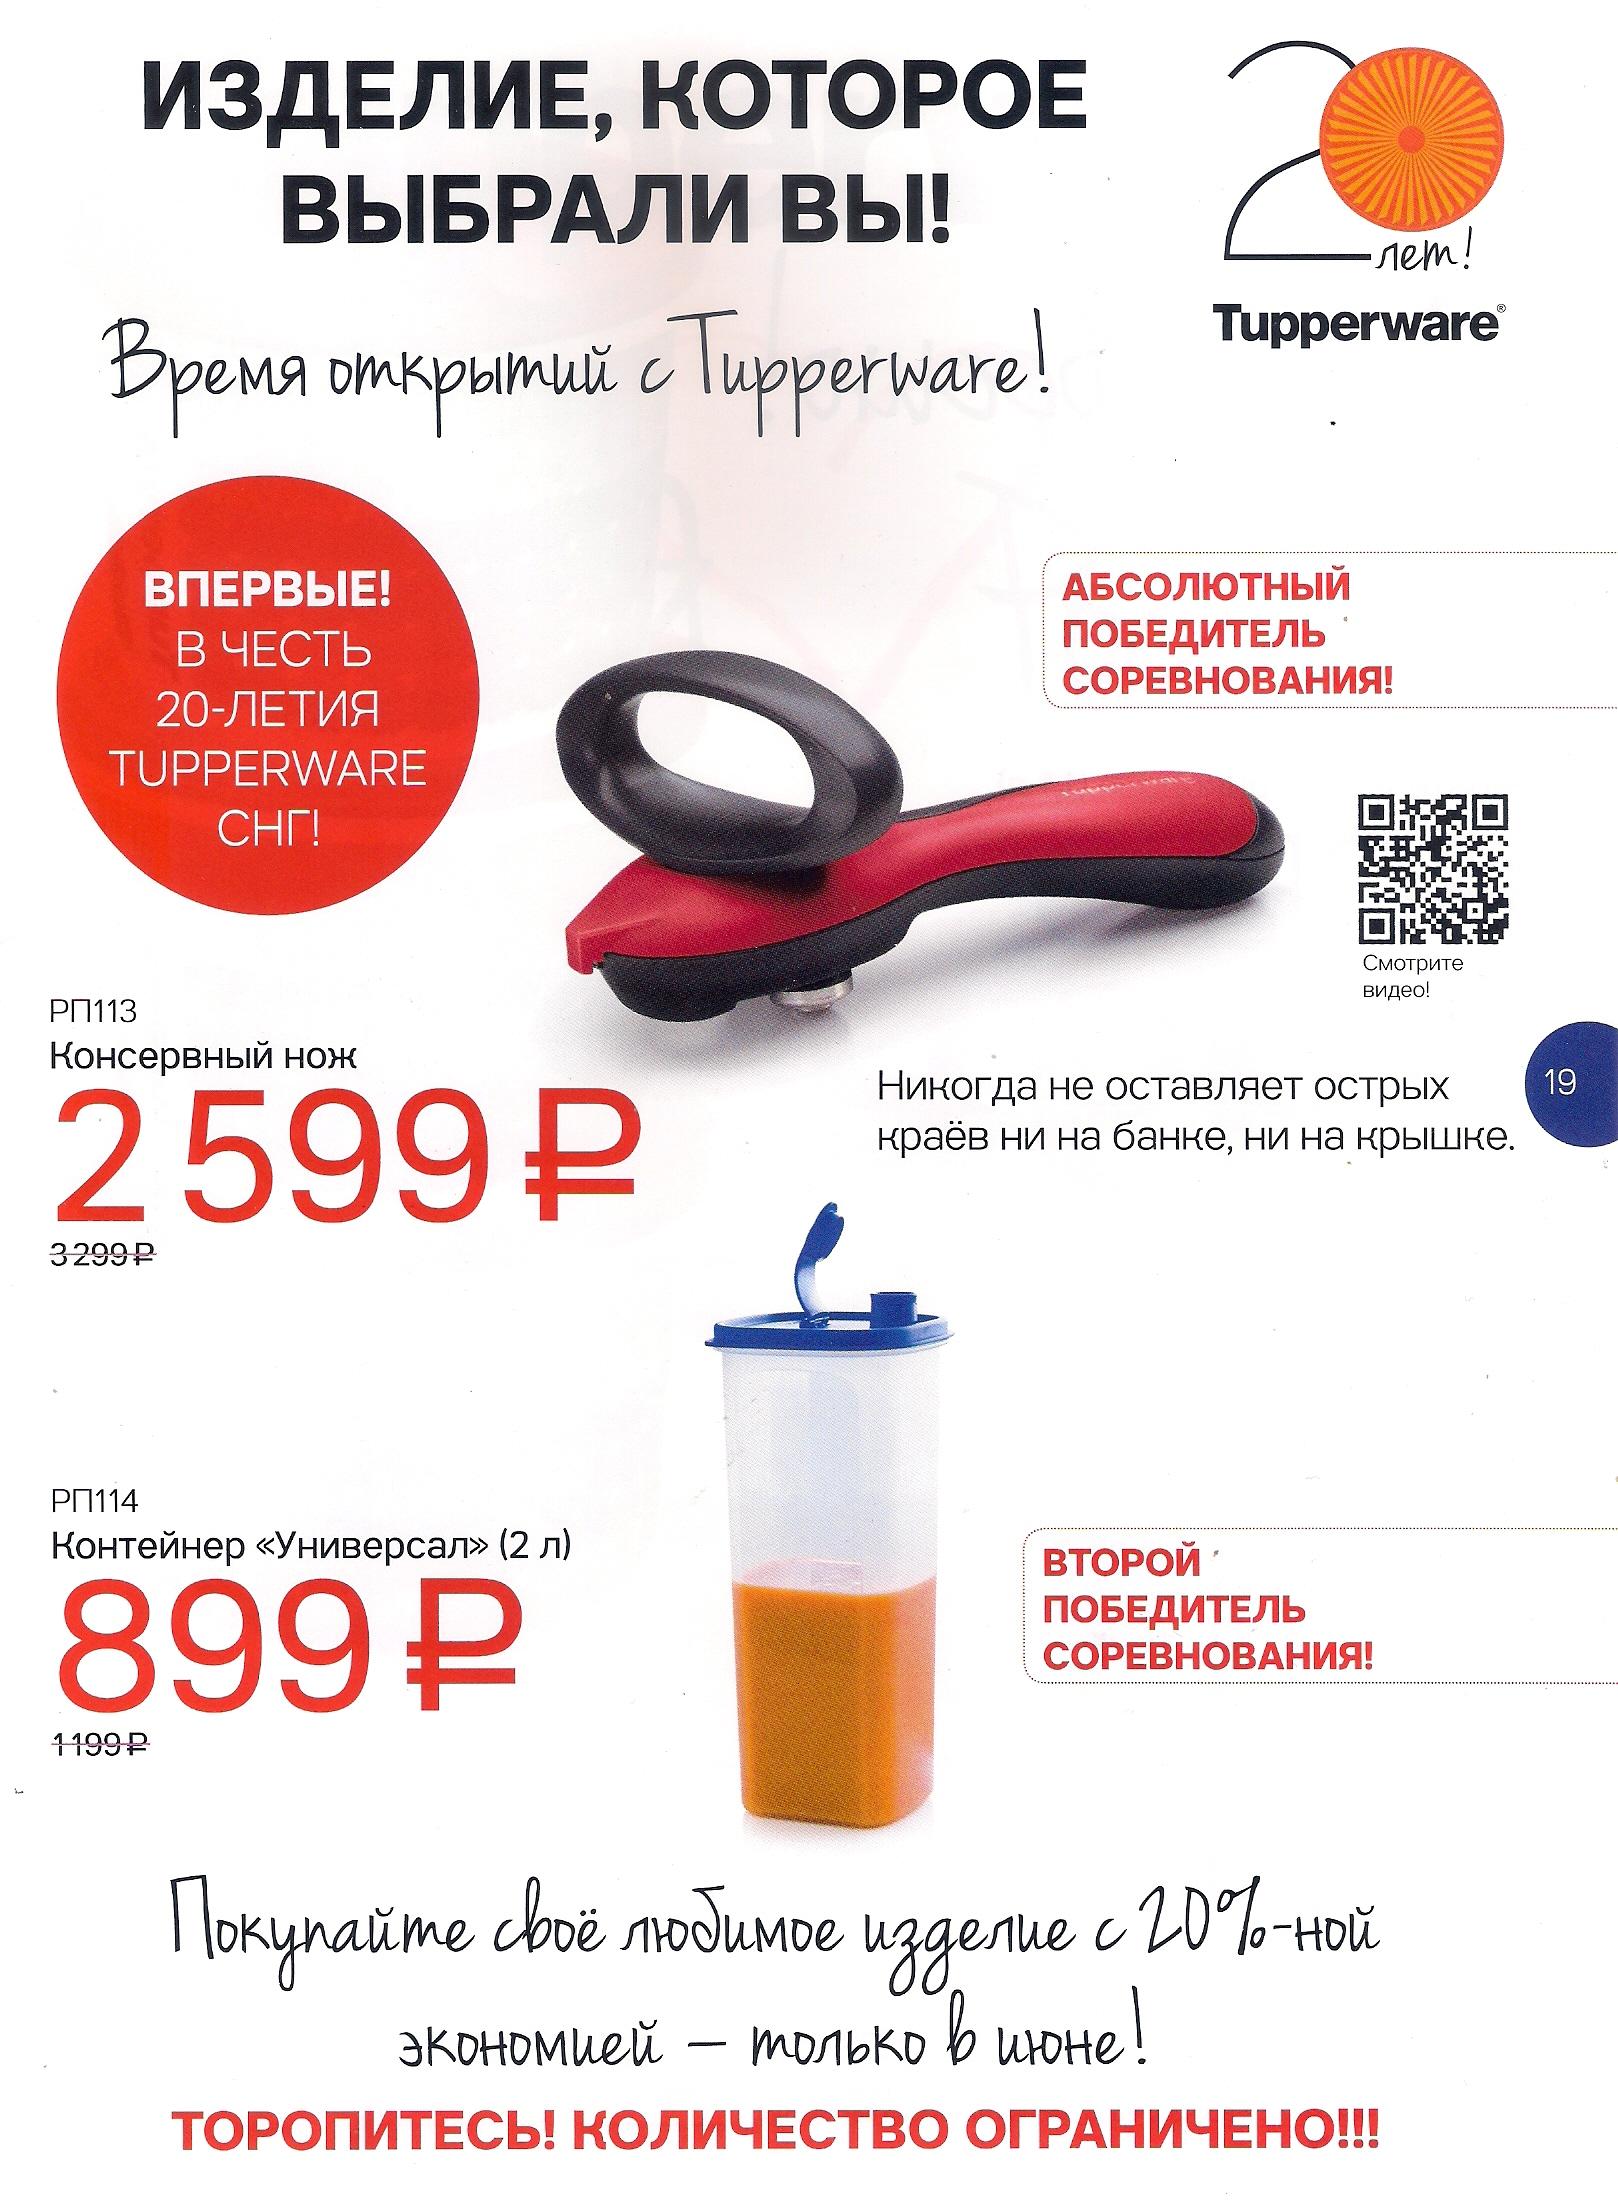 http://tupperware-online.ru/images/upload/16l.jpg